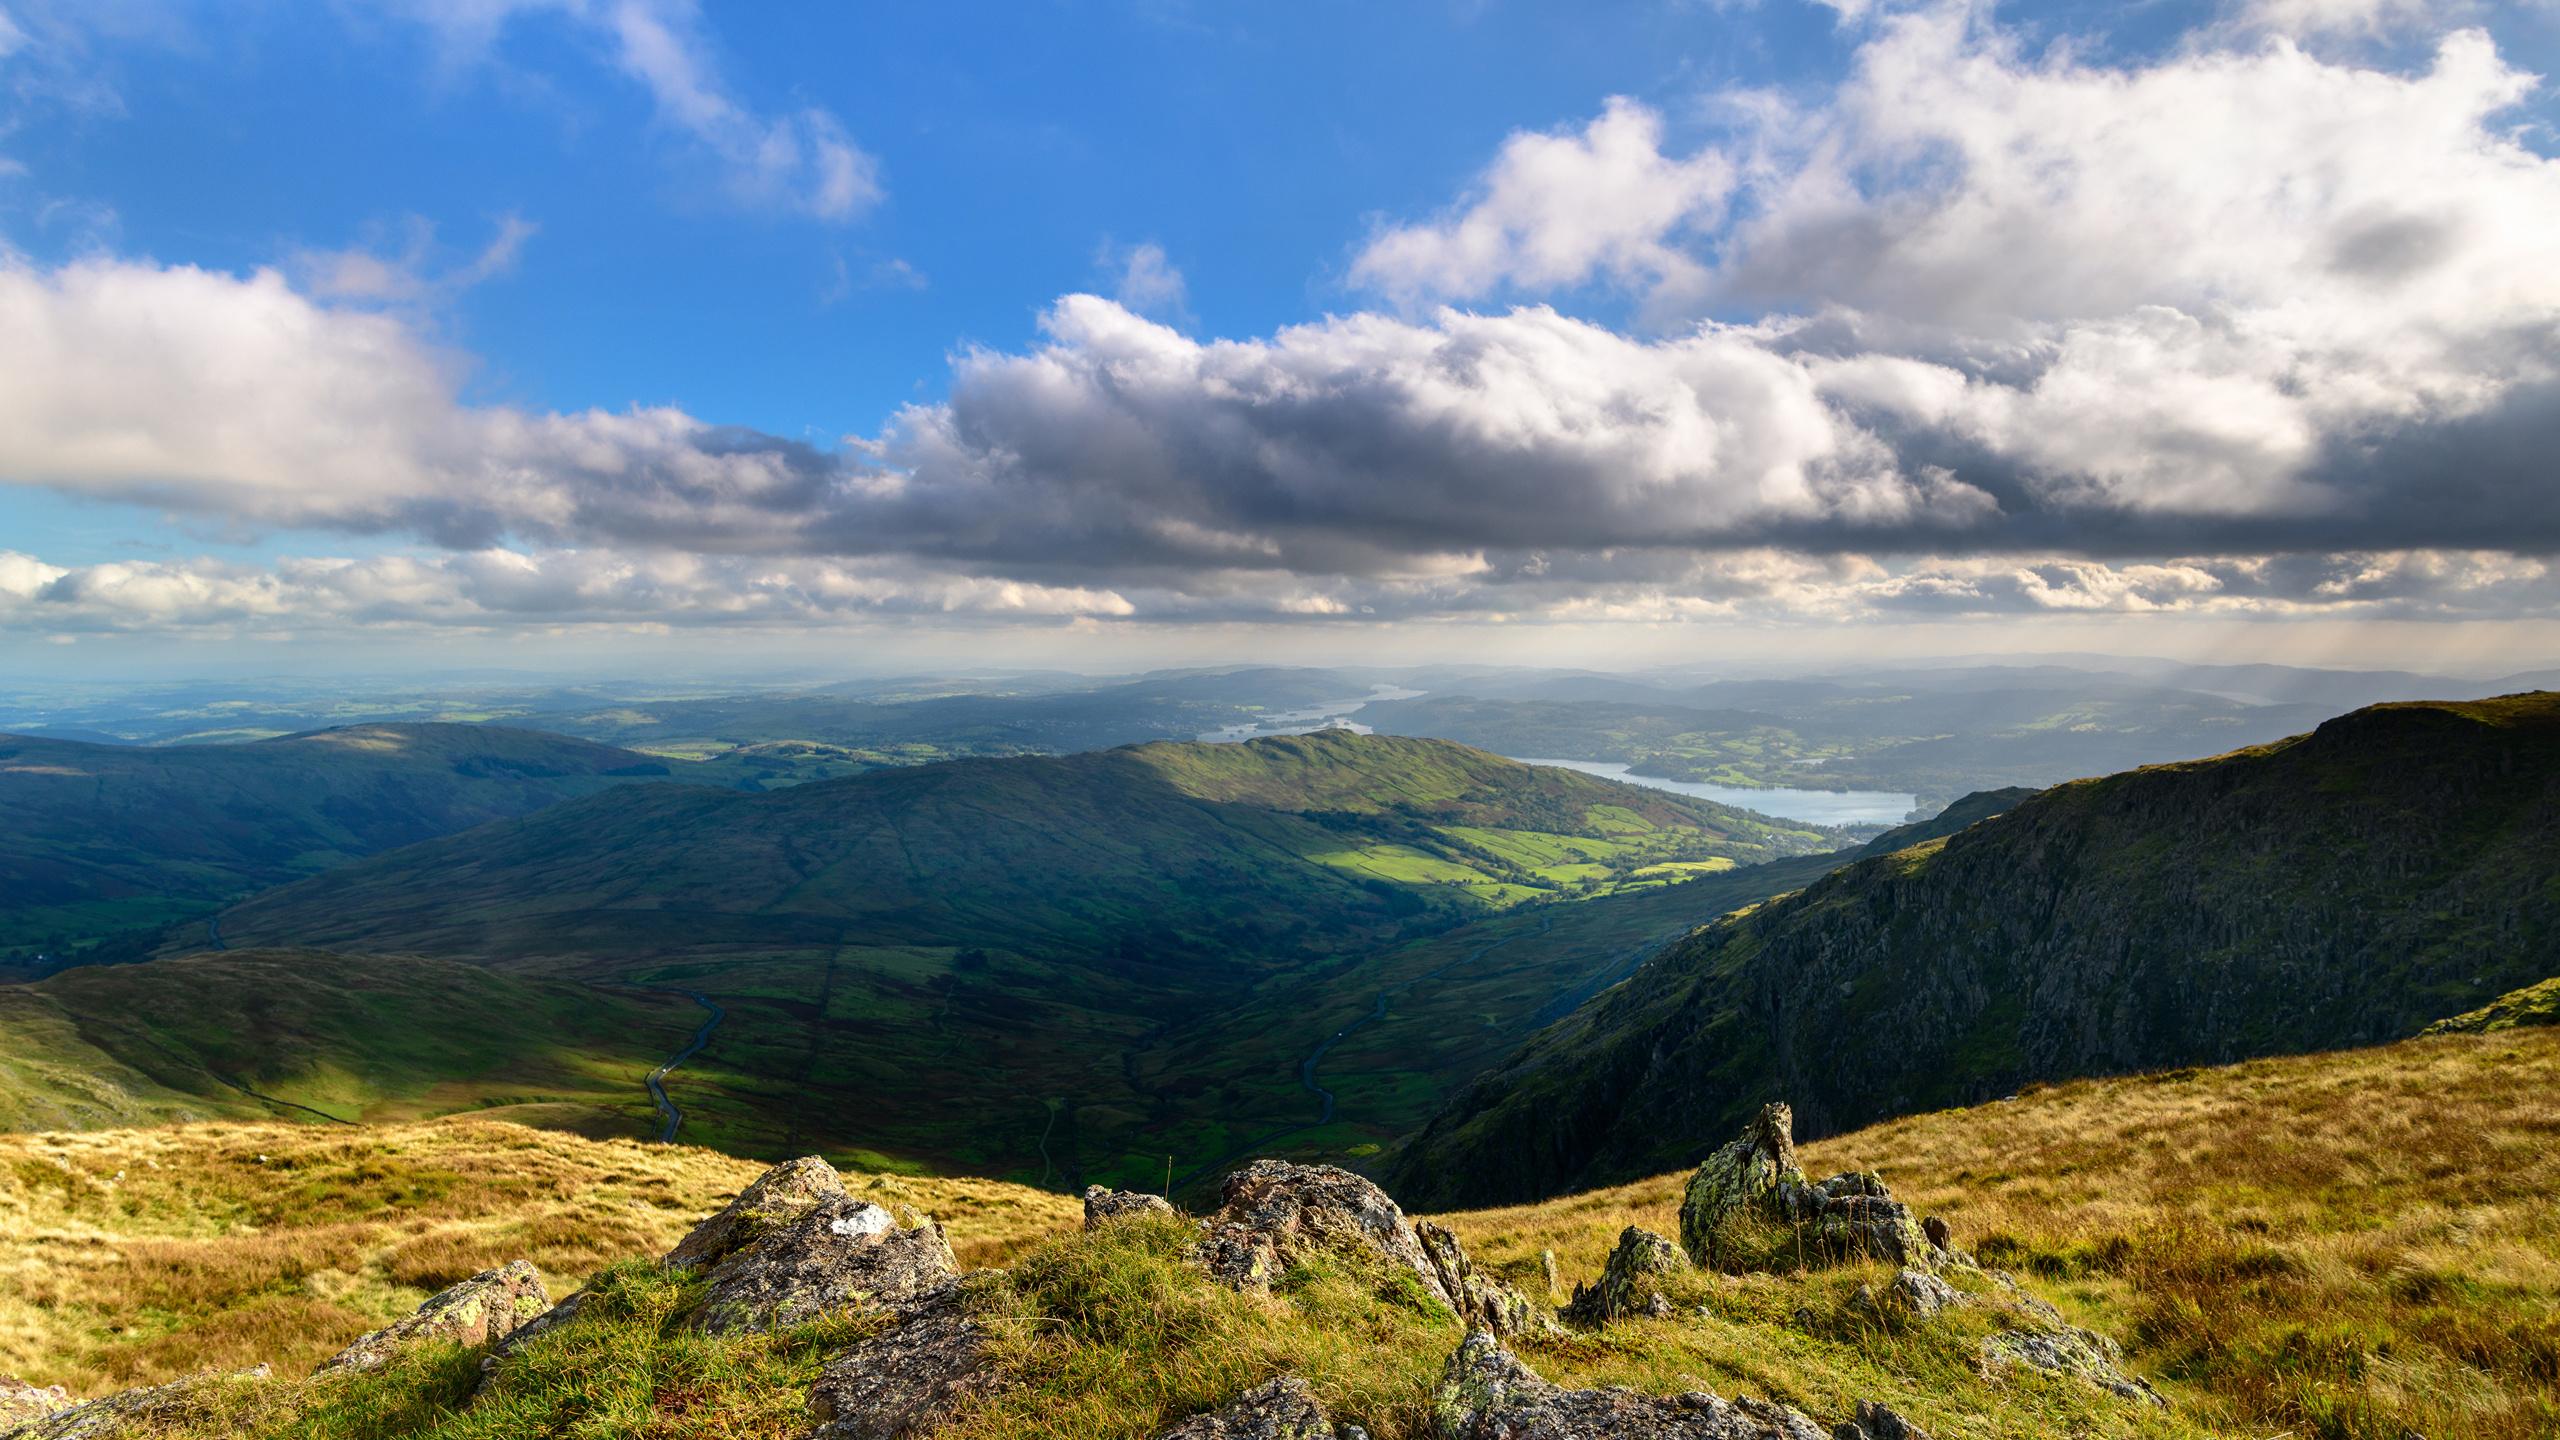 англия, горы, озеро, lake district, cumbria, скала, облака, природа